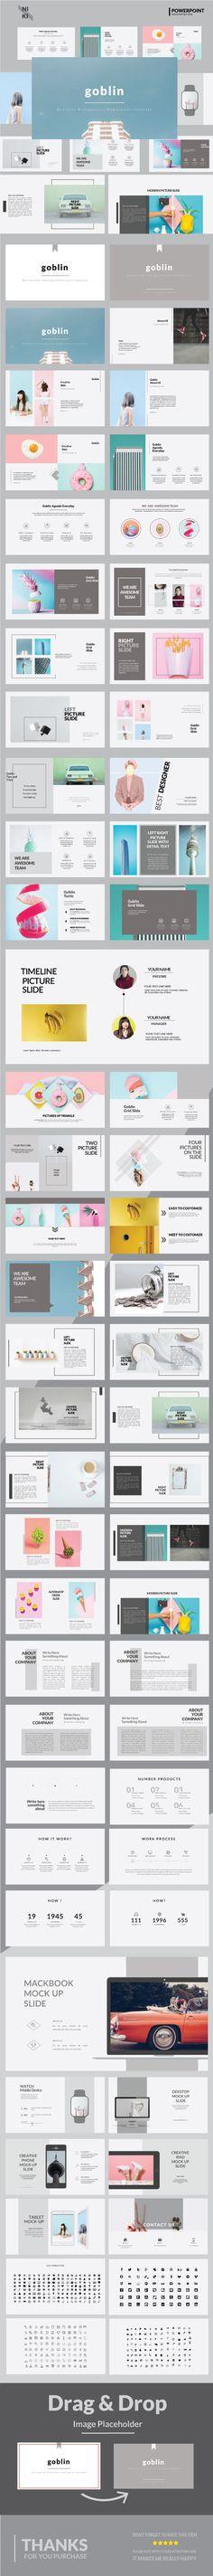 Goblin Multipurpose PowerPoint Template — Powerpoint PPT #entrepreneur #corporate • Download ➝ https://graphicriver.net/item/goblin-multipurpose-powerpoint-template/19455100?ref=pxcr